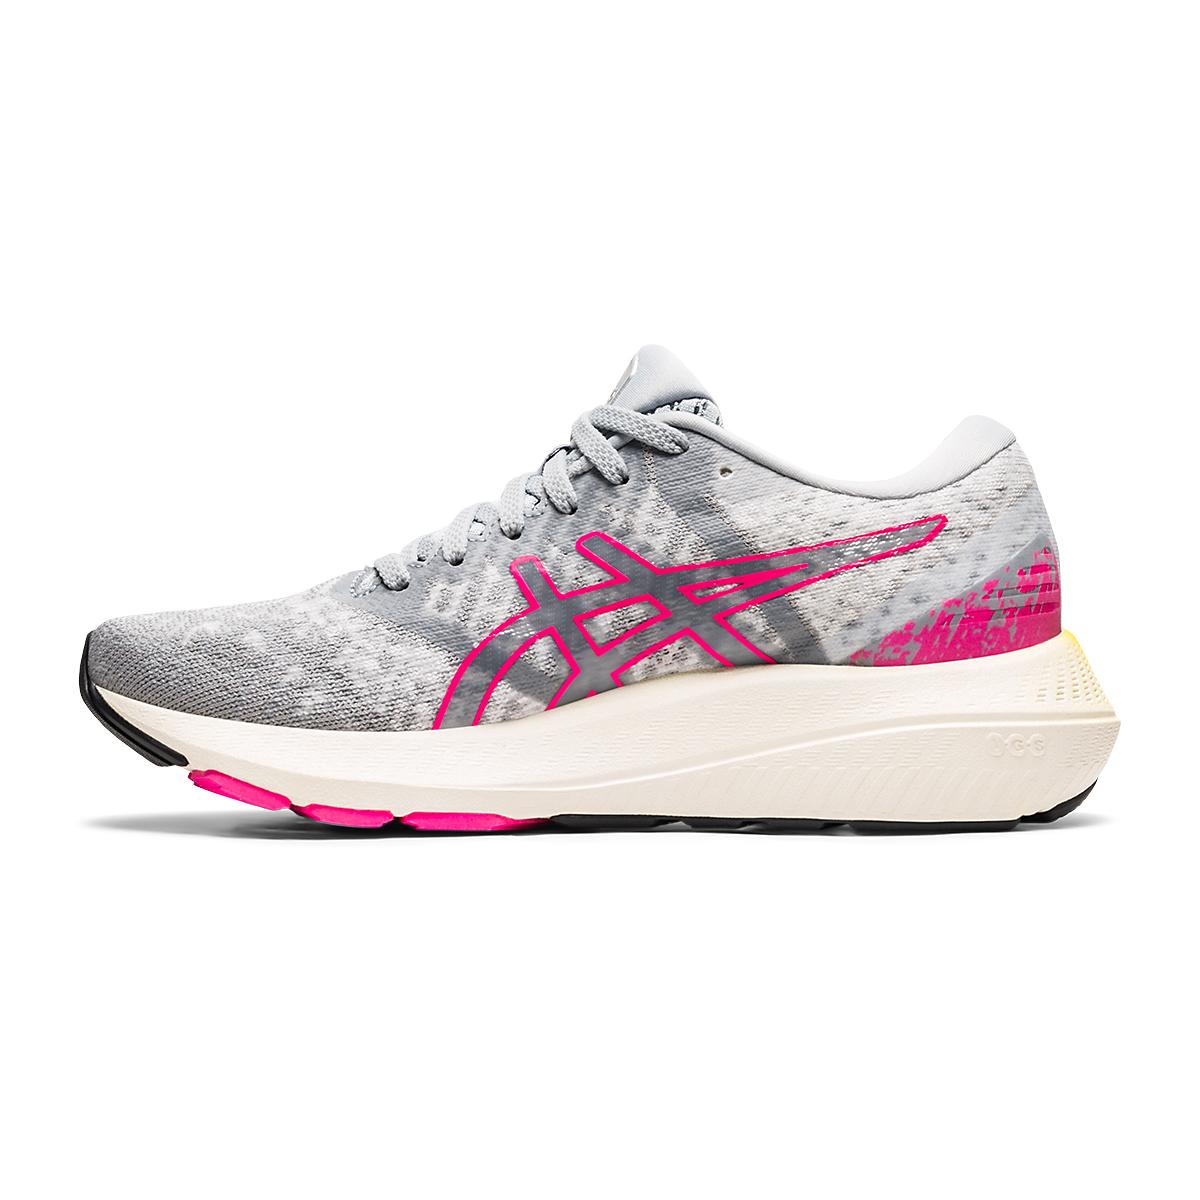 Women's Asics GEL-Kayano Lite Running Shoe - Color: Piedmont Grey/Sheet Rock - Size: 5 - Width: Regular, Piedmont Grey/Sheet Rock, large, image 2